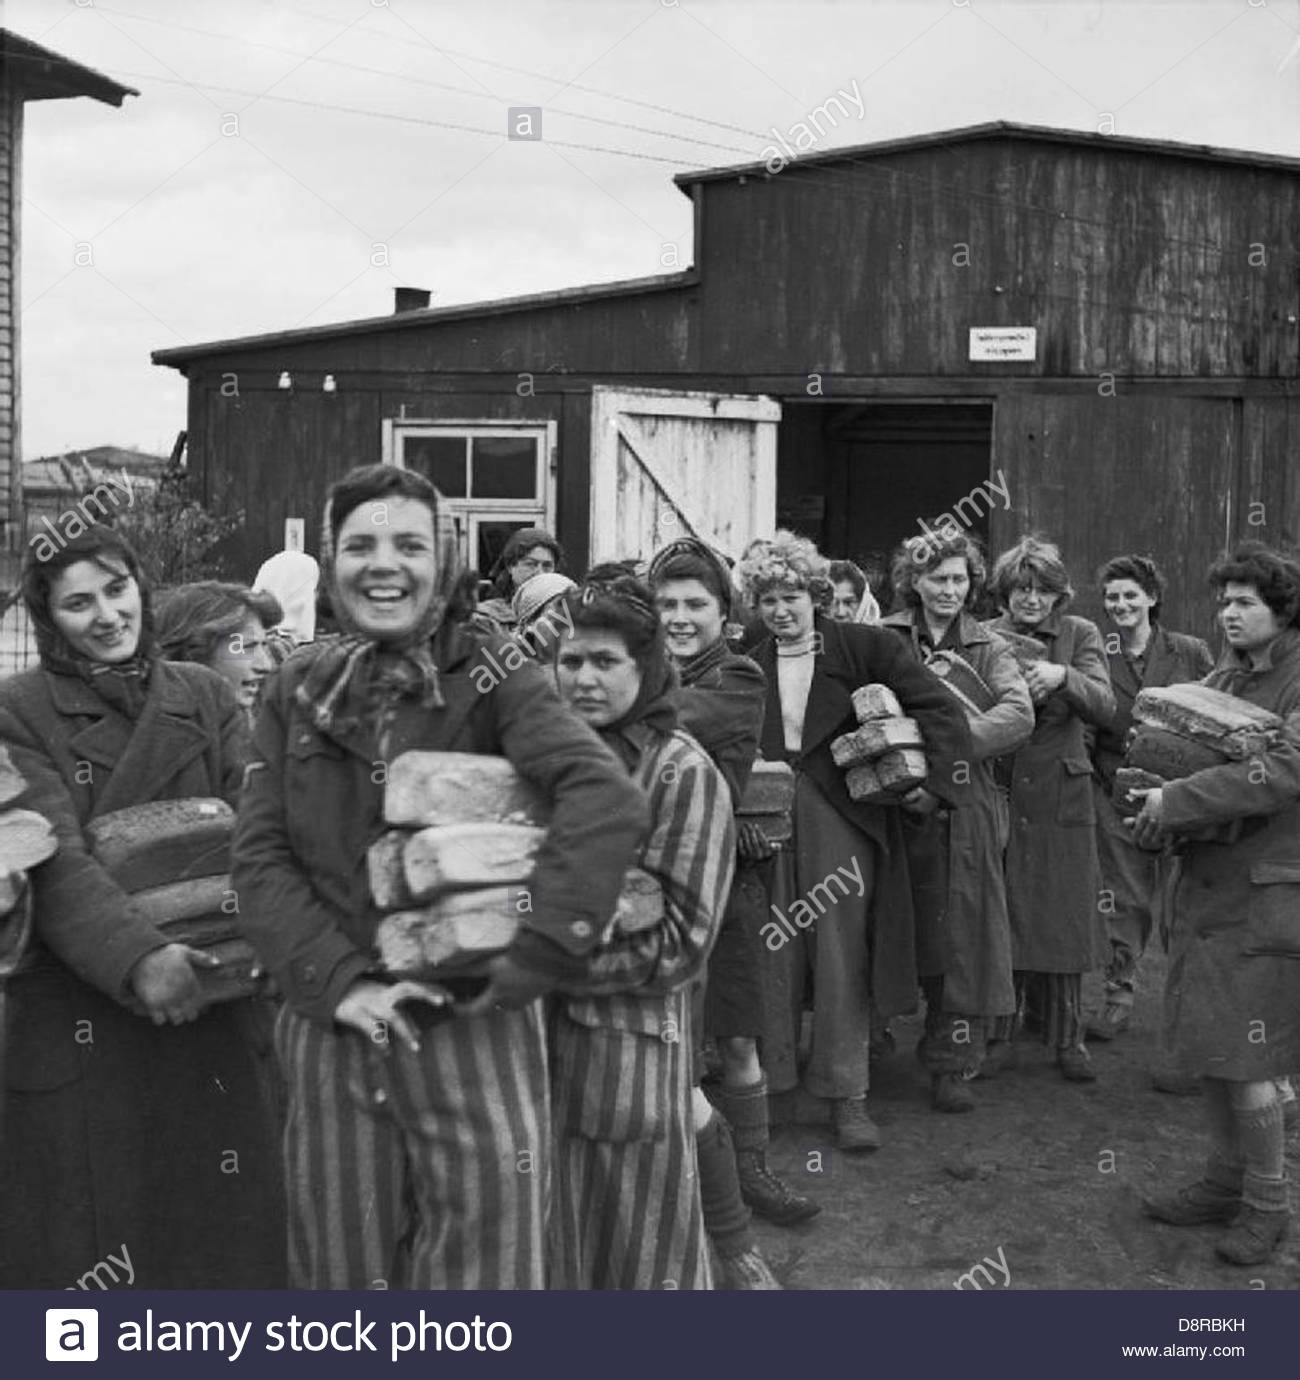 The Liberation of Bergen-belsen Concentration Camp, April 1945 BU4274. Stock Foto